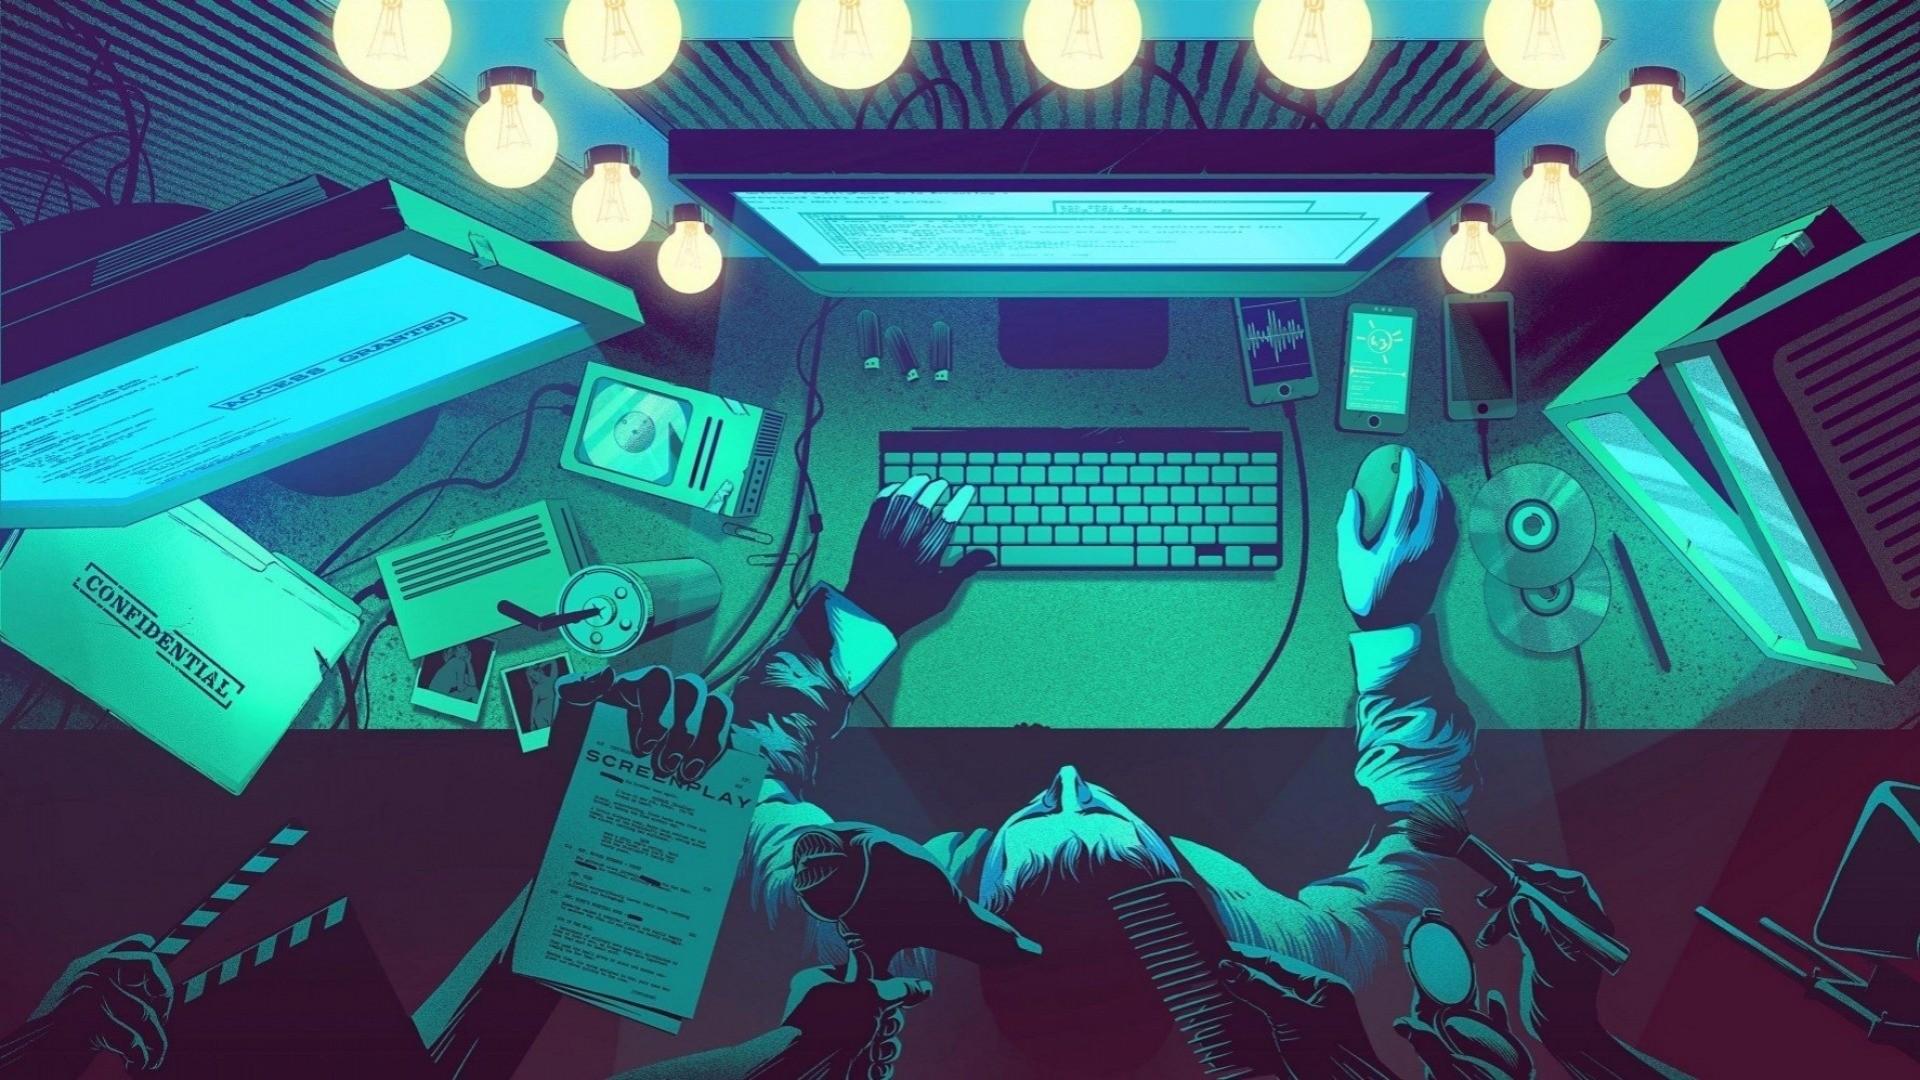 Hacker Desktop wallpaper